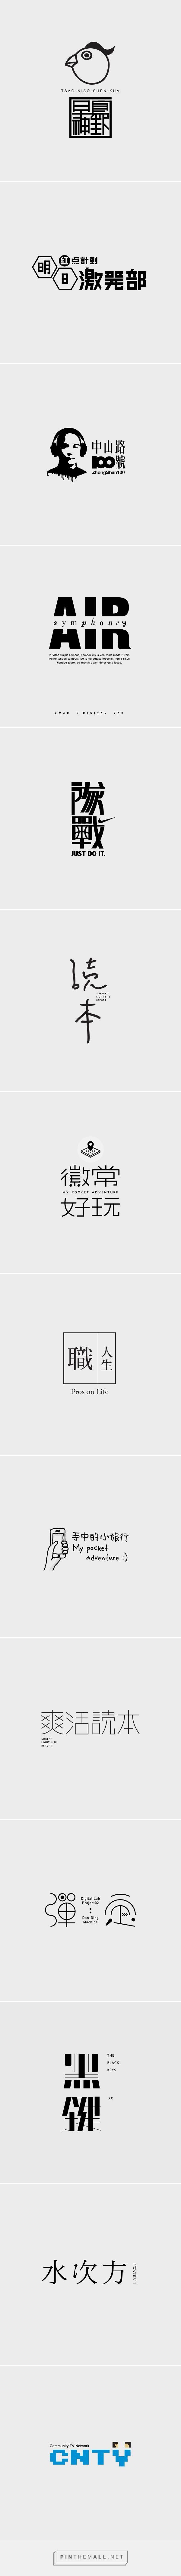 Christy Wang - 活動標準字設計 / LOGO / Typography on Behance